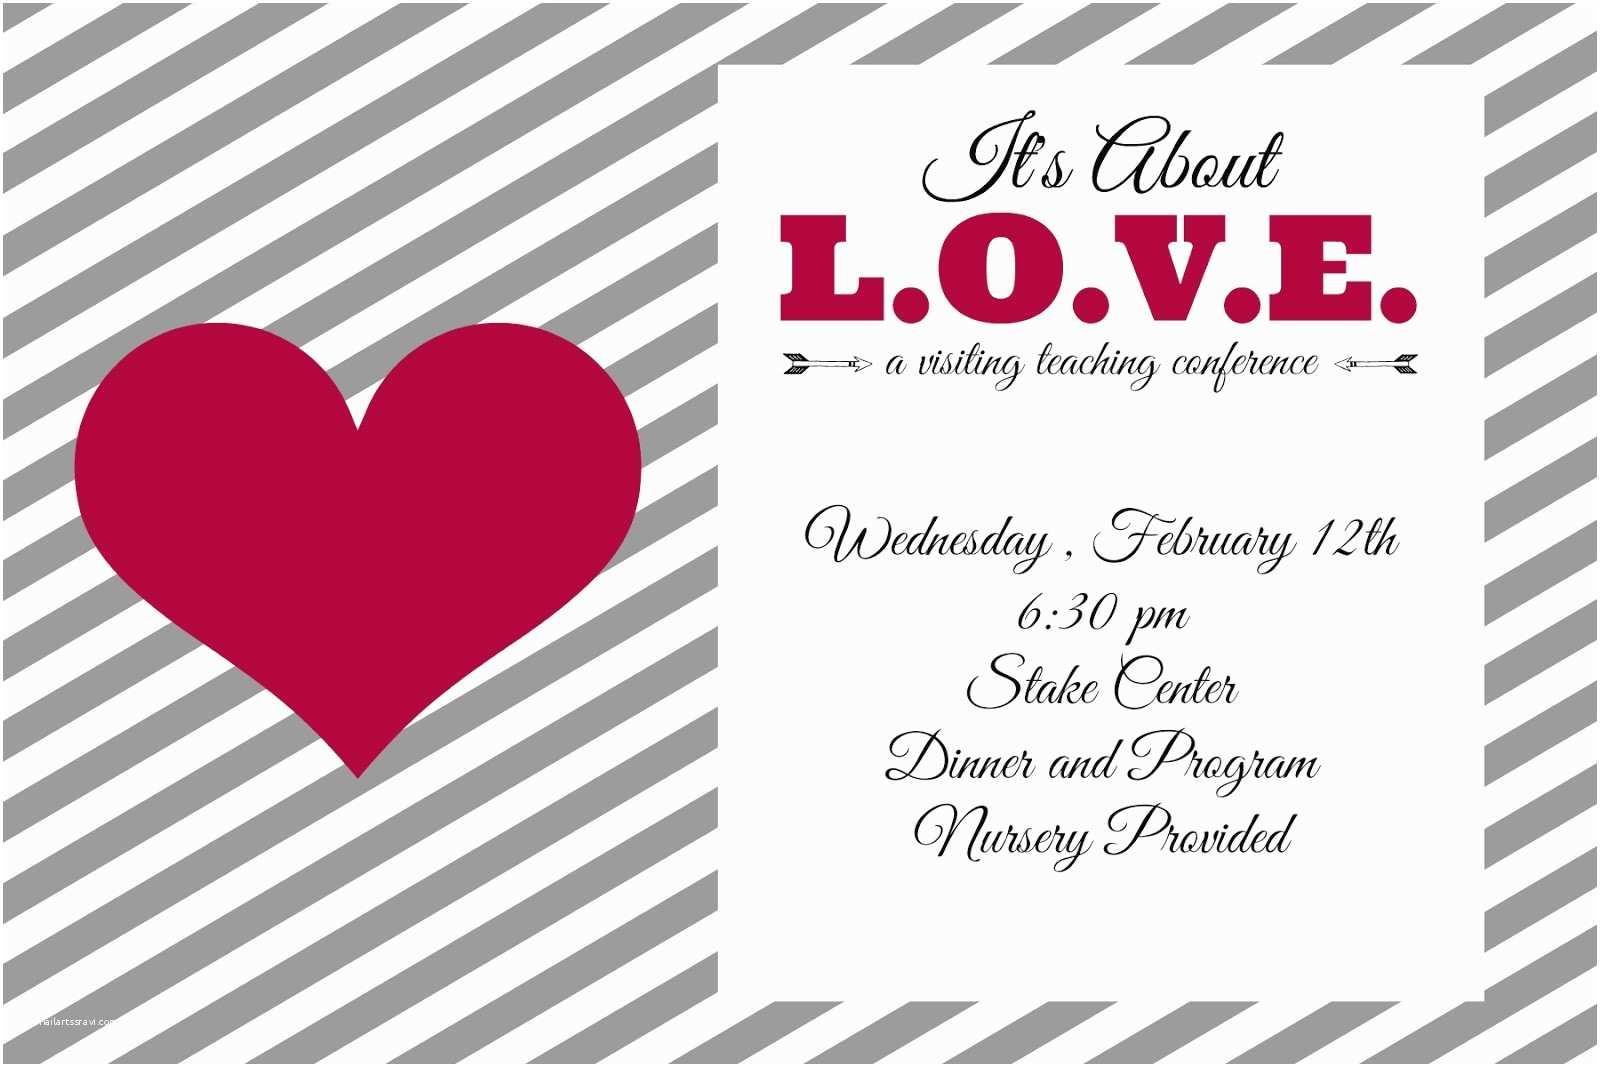 Valentines Day Party Invitations Interesting Valentine Day Party Invitation Card Ideas